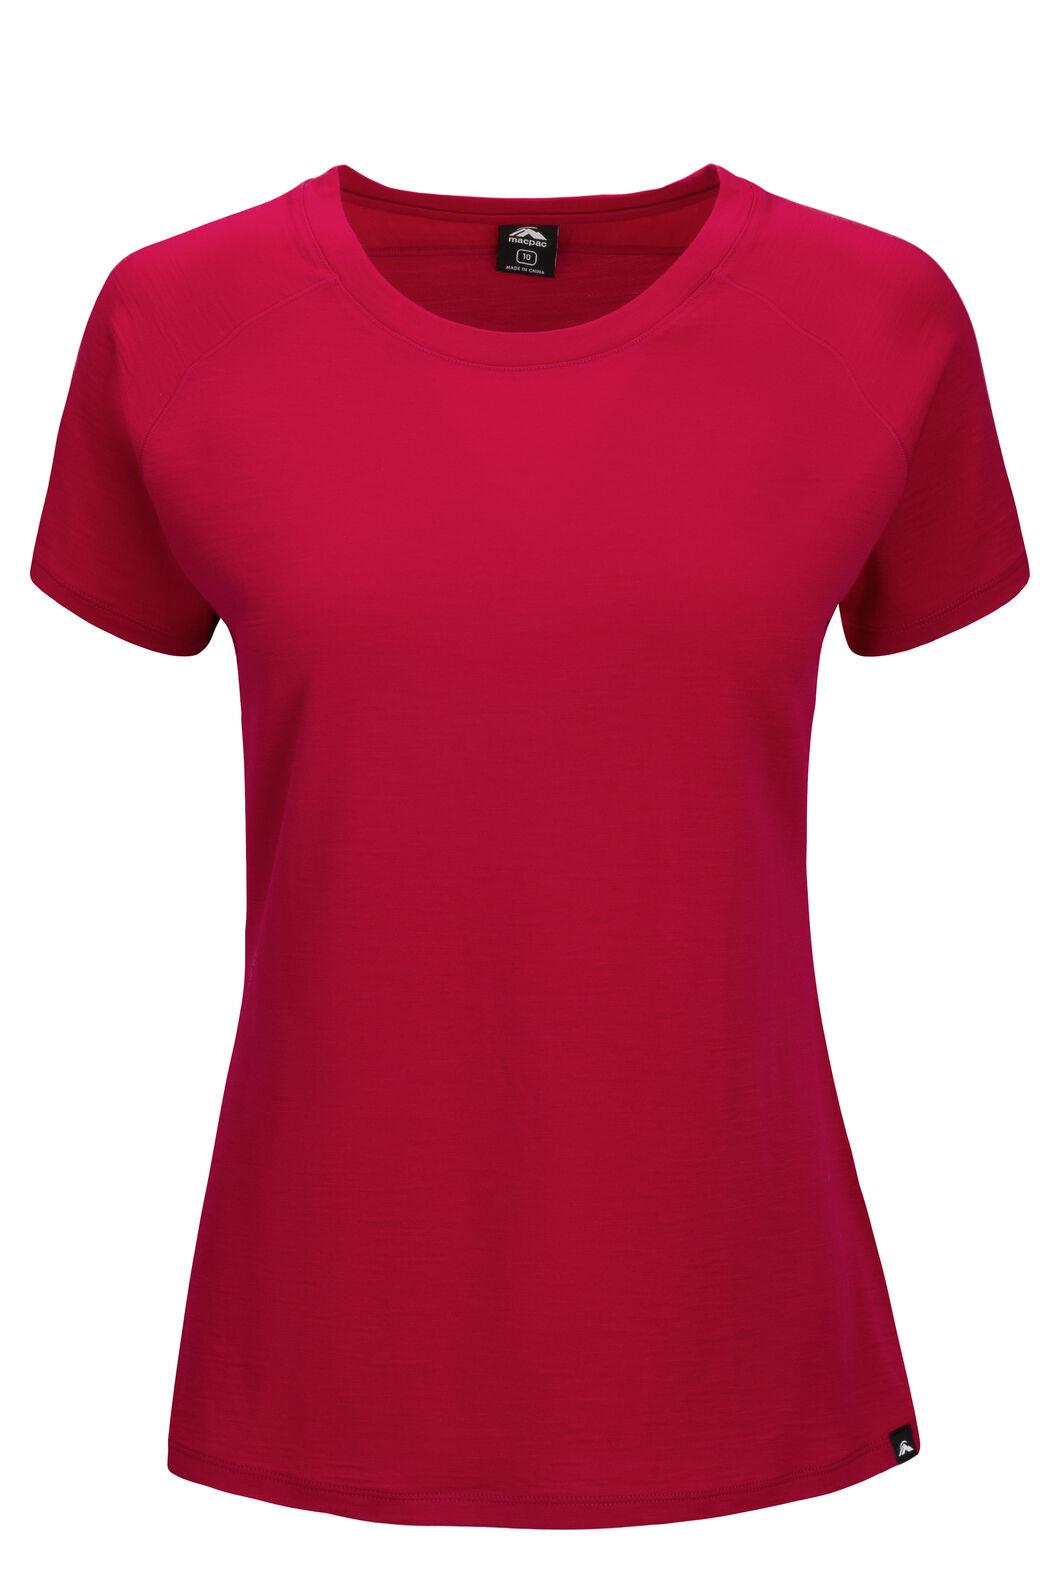 Macpac Ella Short Sleeve Merino Tee — Women's, Persian Red, hi-res